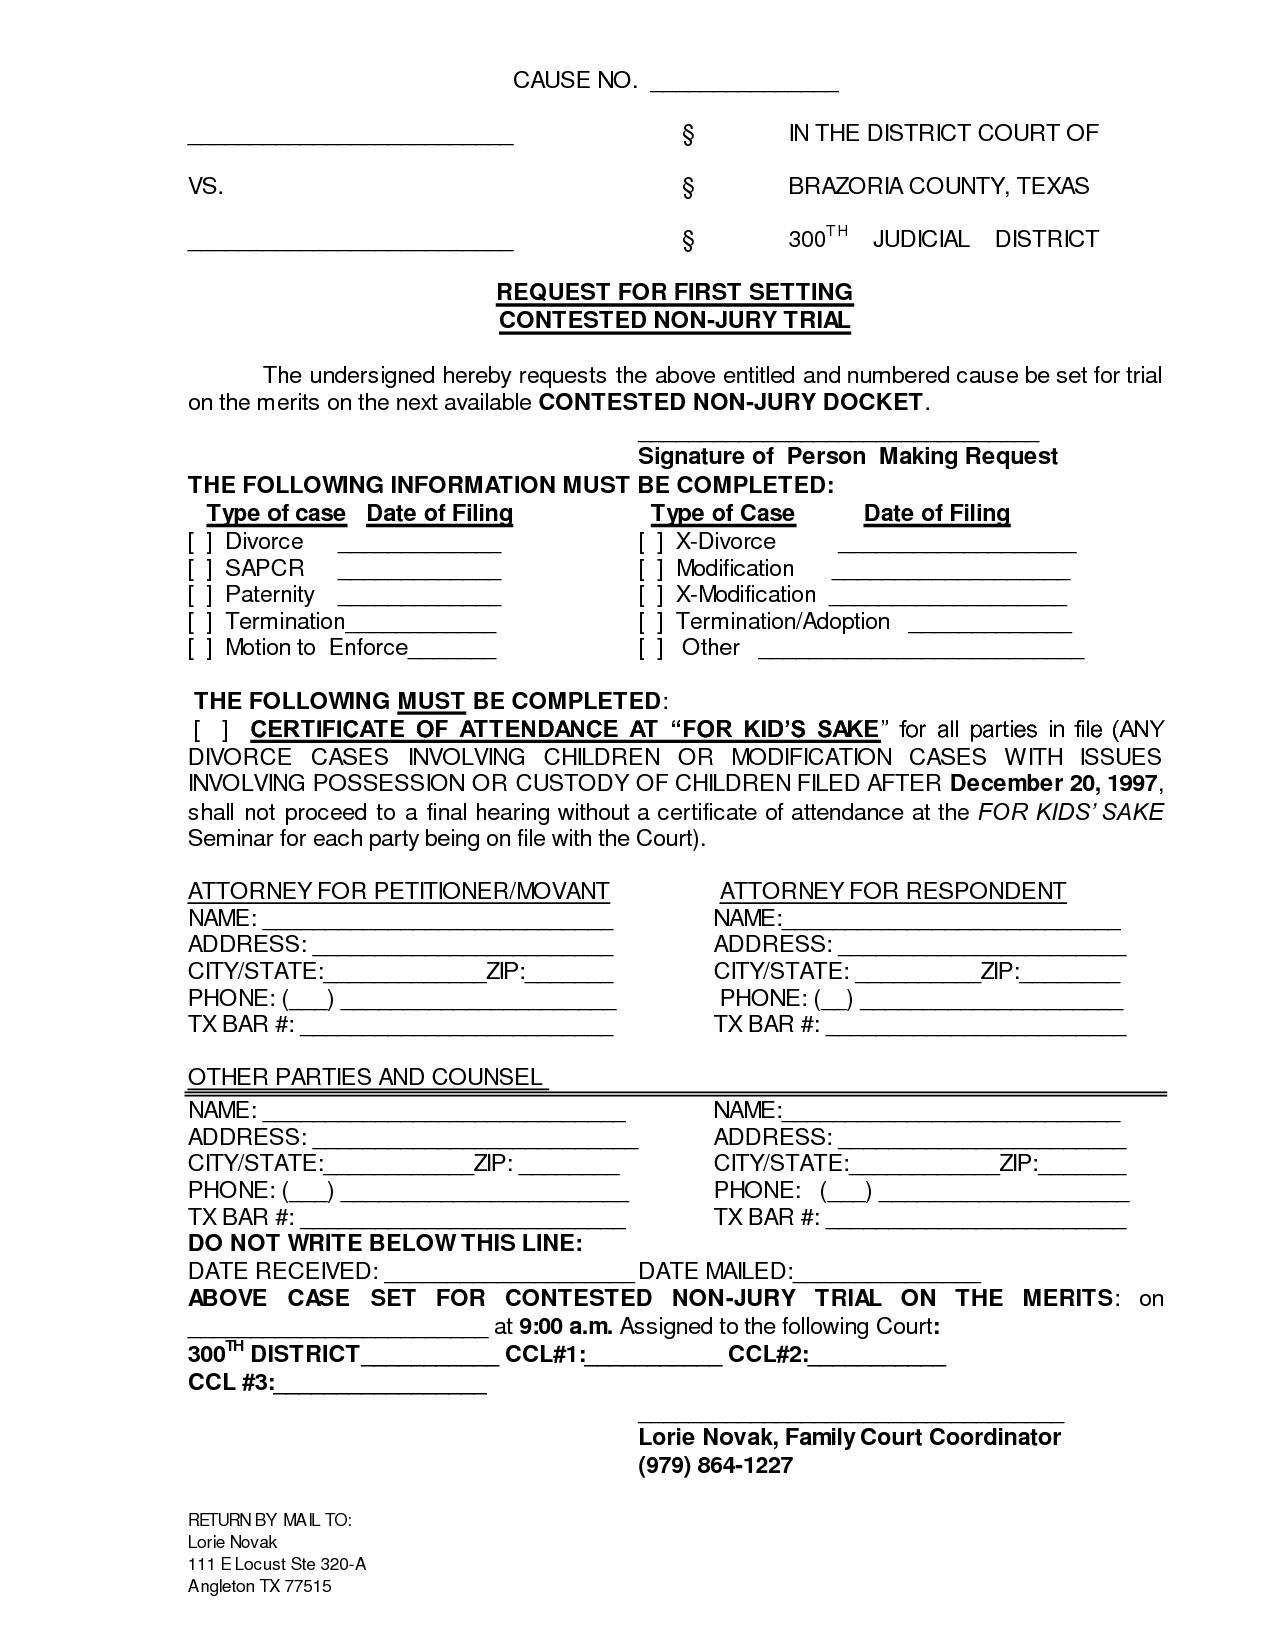 Printable Sample Divorce Documents Form | Laywers Template Forms - Free Printable Legal Documents Forms